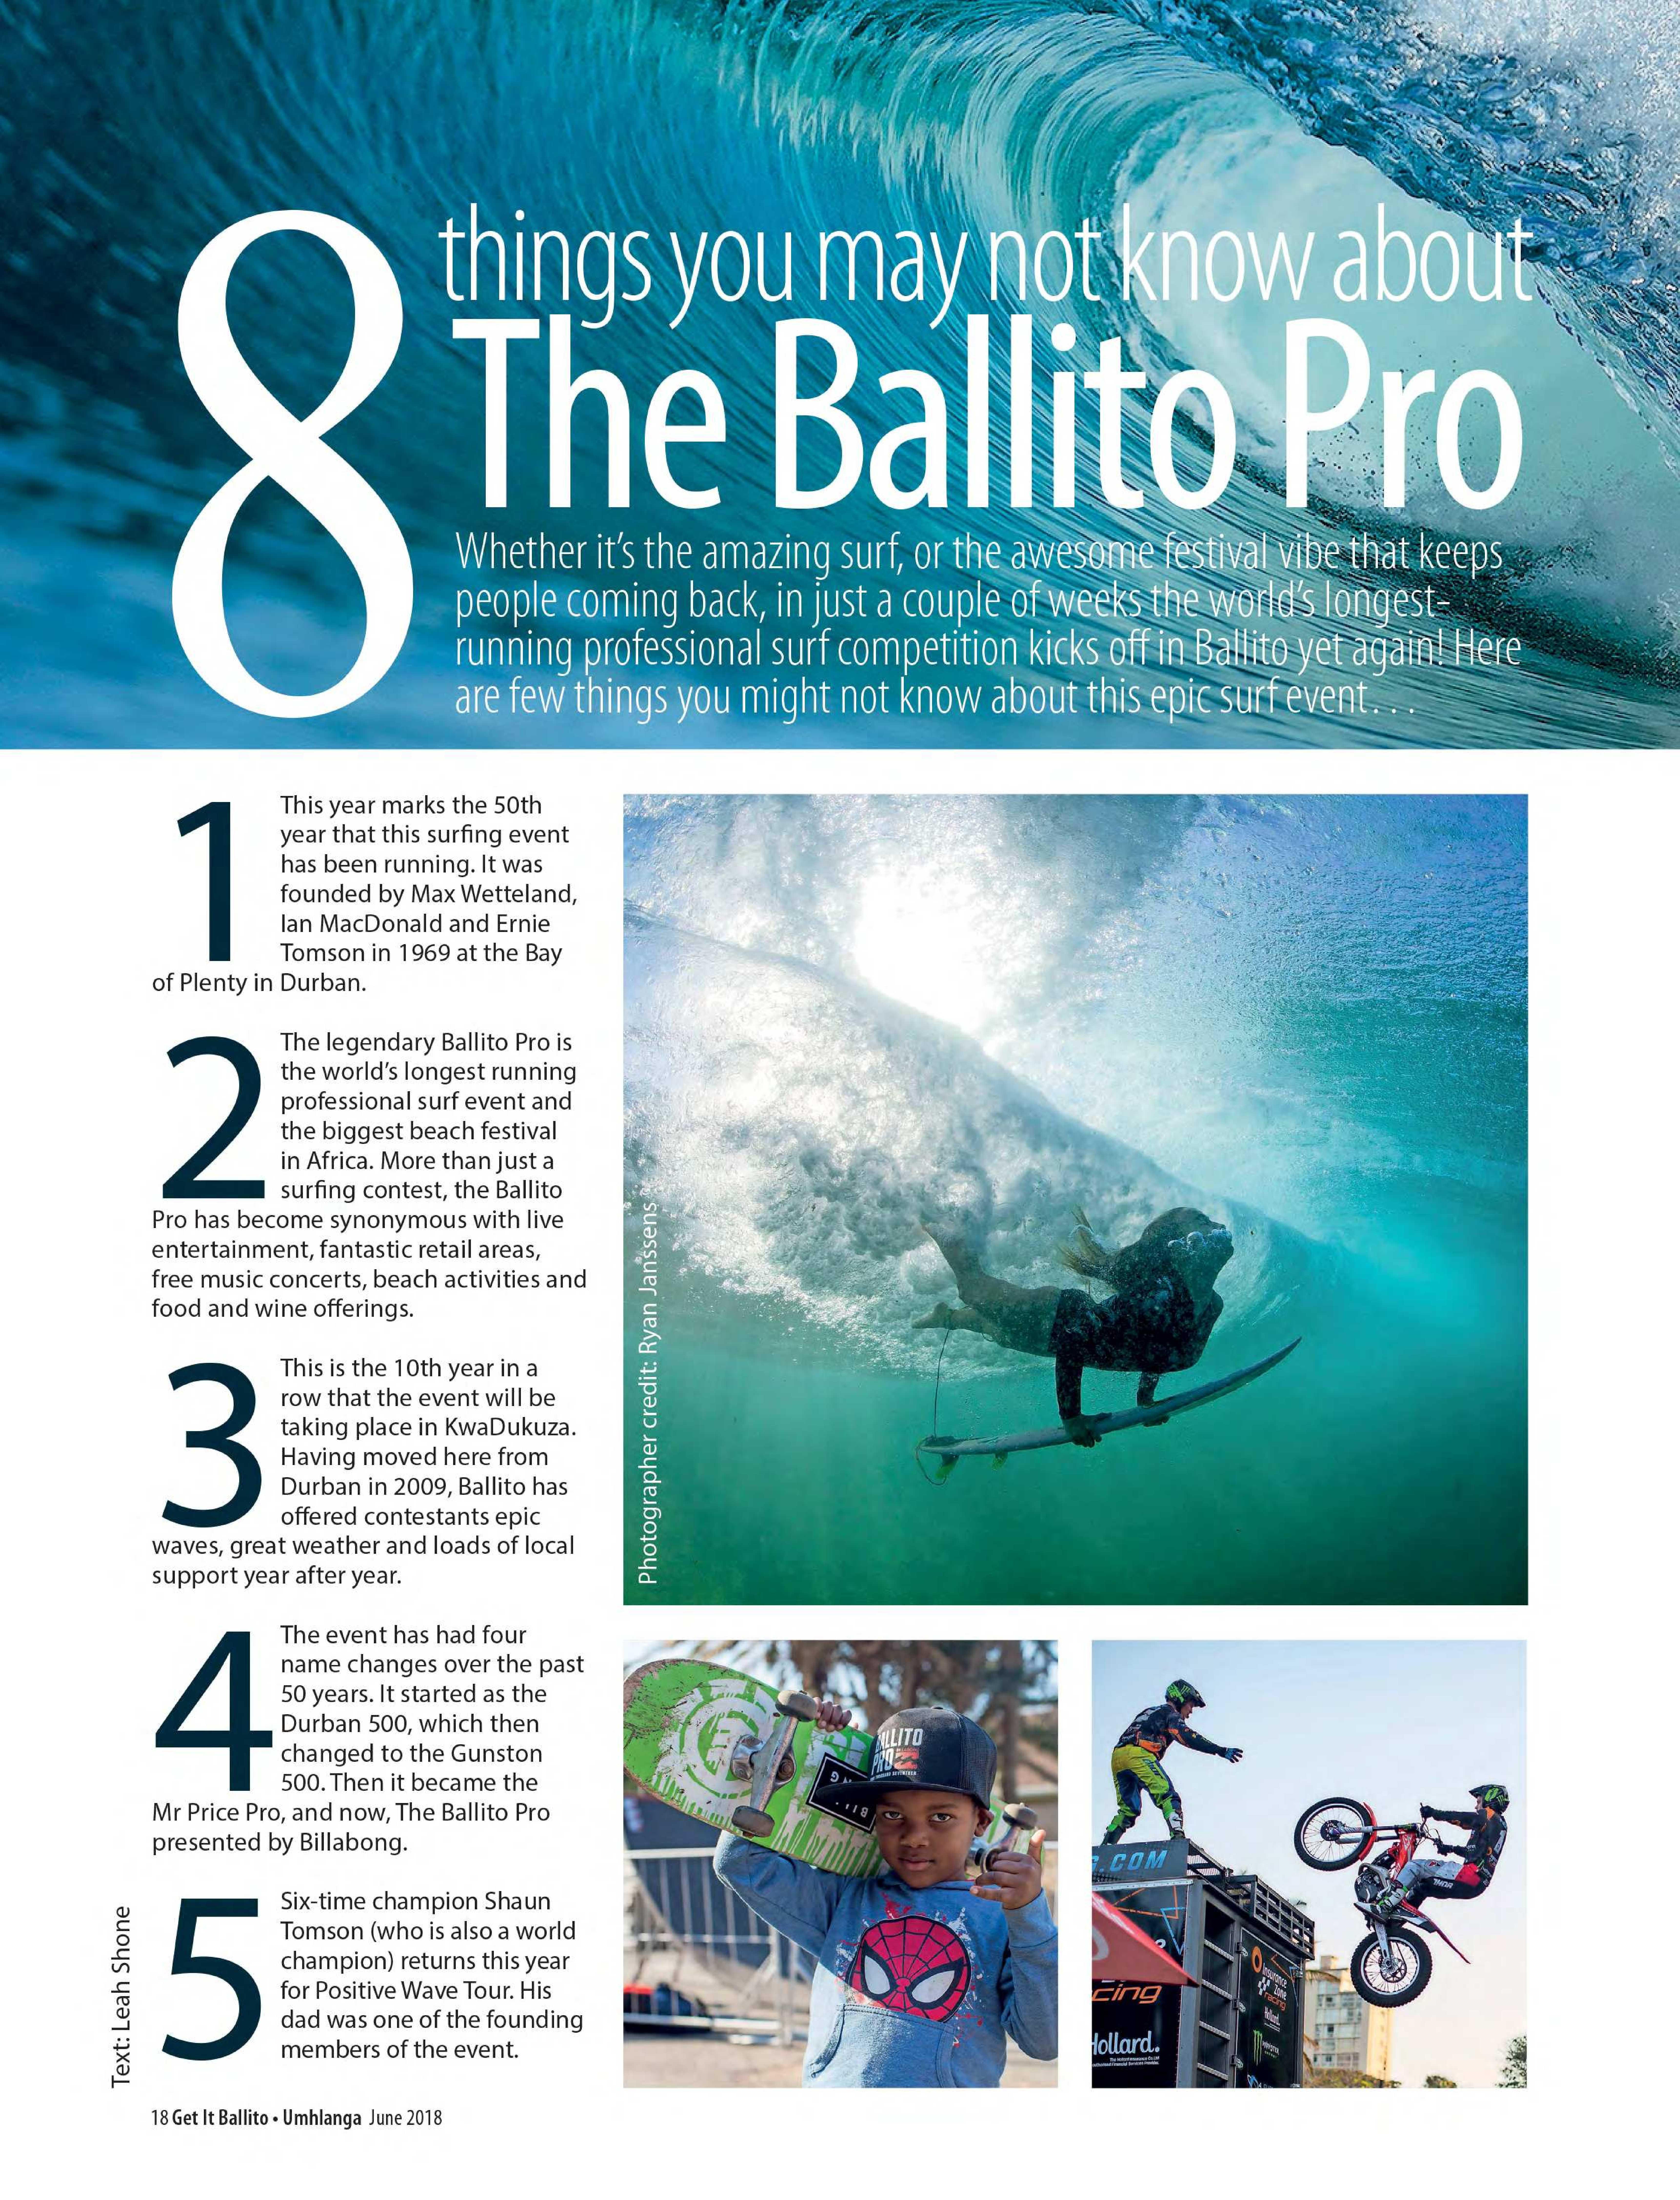 get-magazine-ballitoumhlanga-june-2018-epapers-page-20